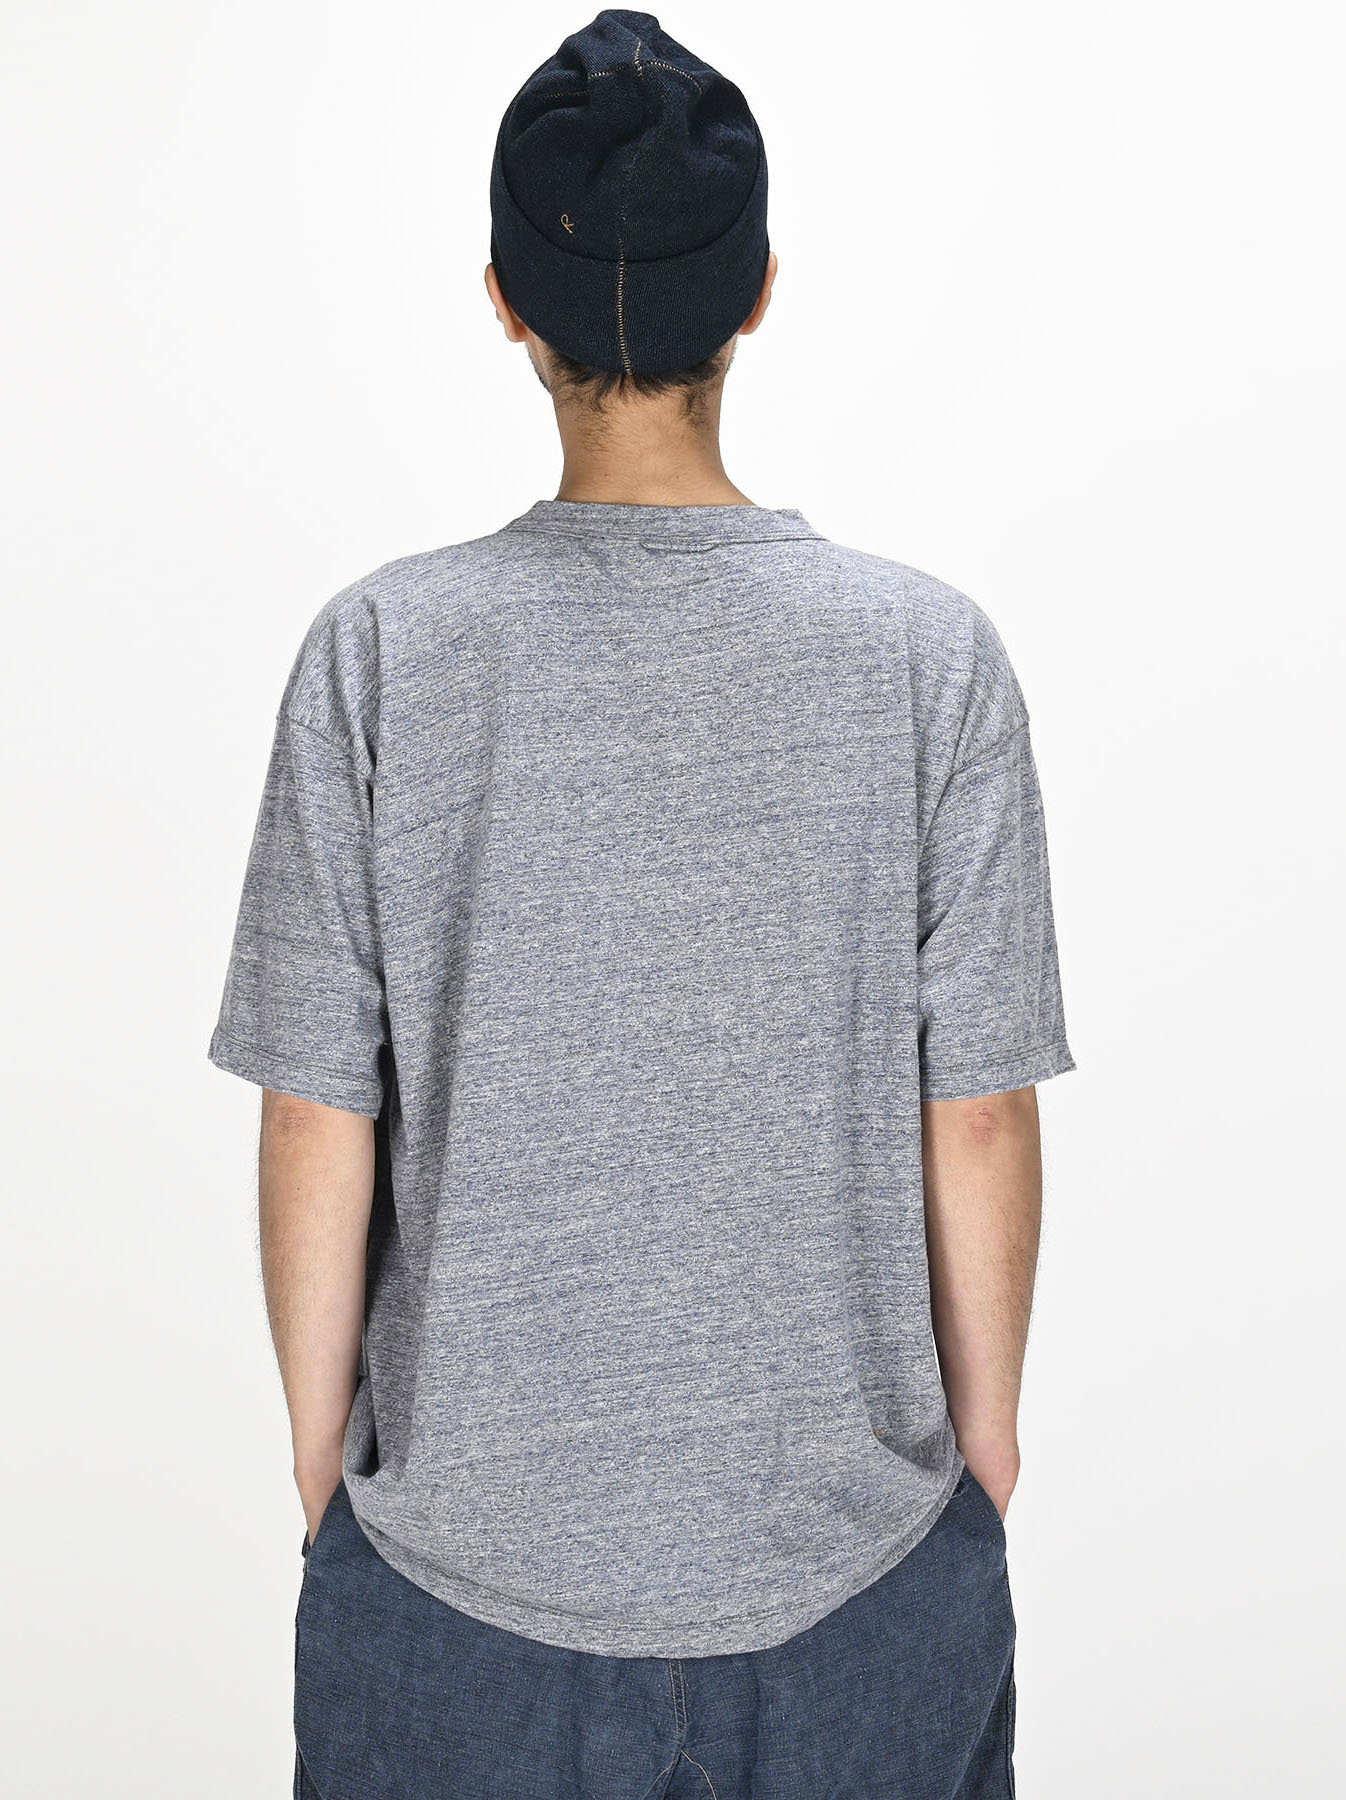 Top Sumite de Chicken T-shirt-4